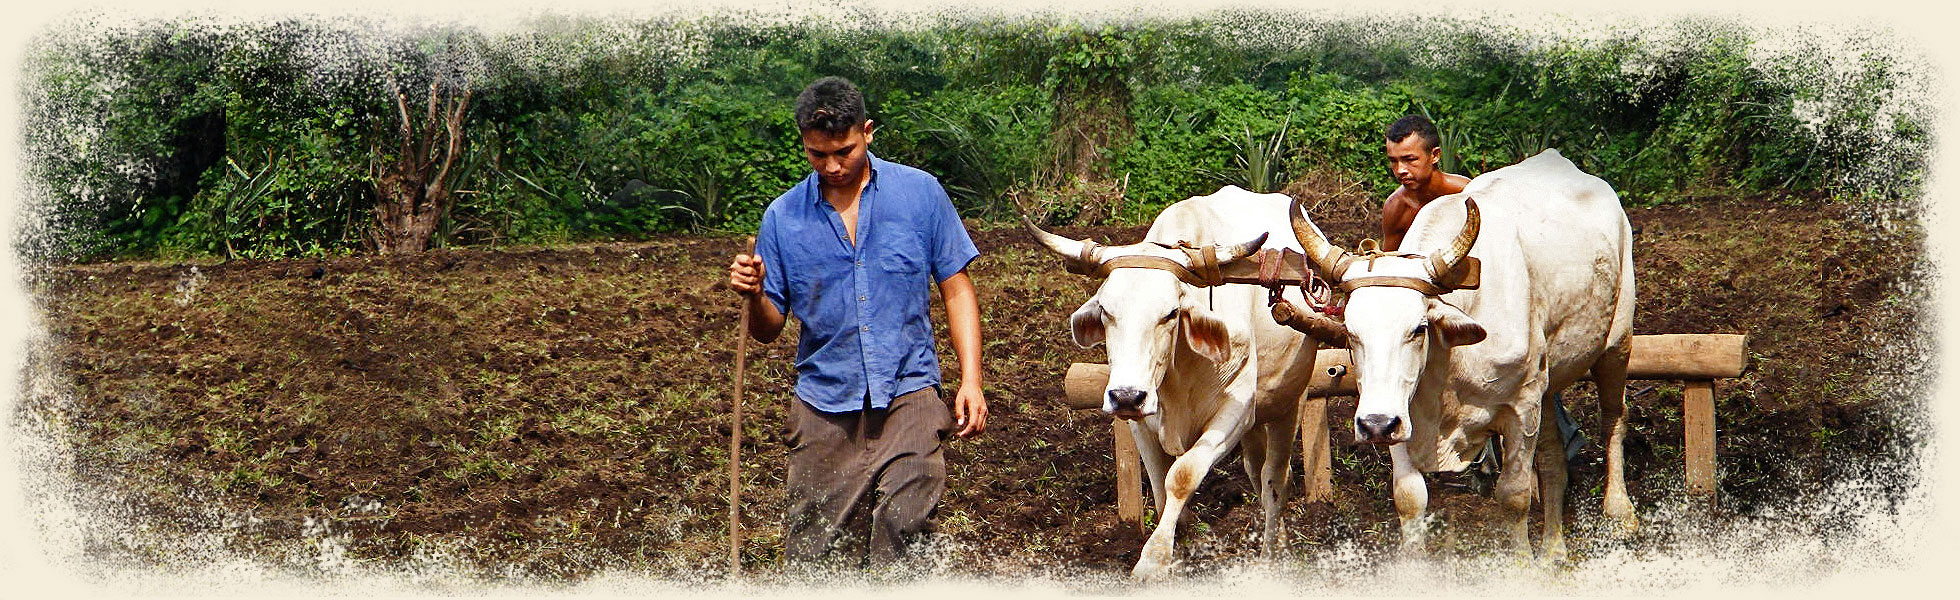 Real Fair Trade Organic Cotton Clothing